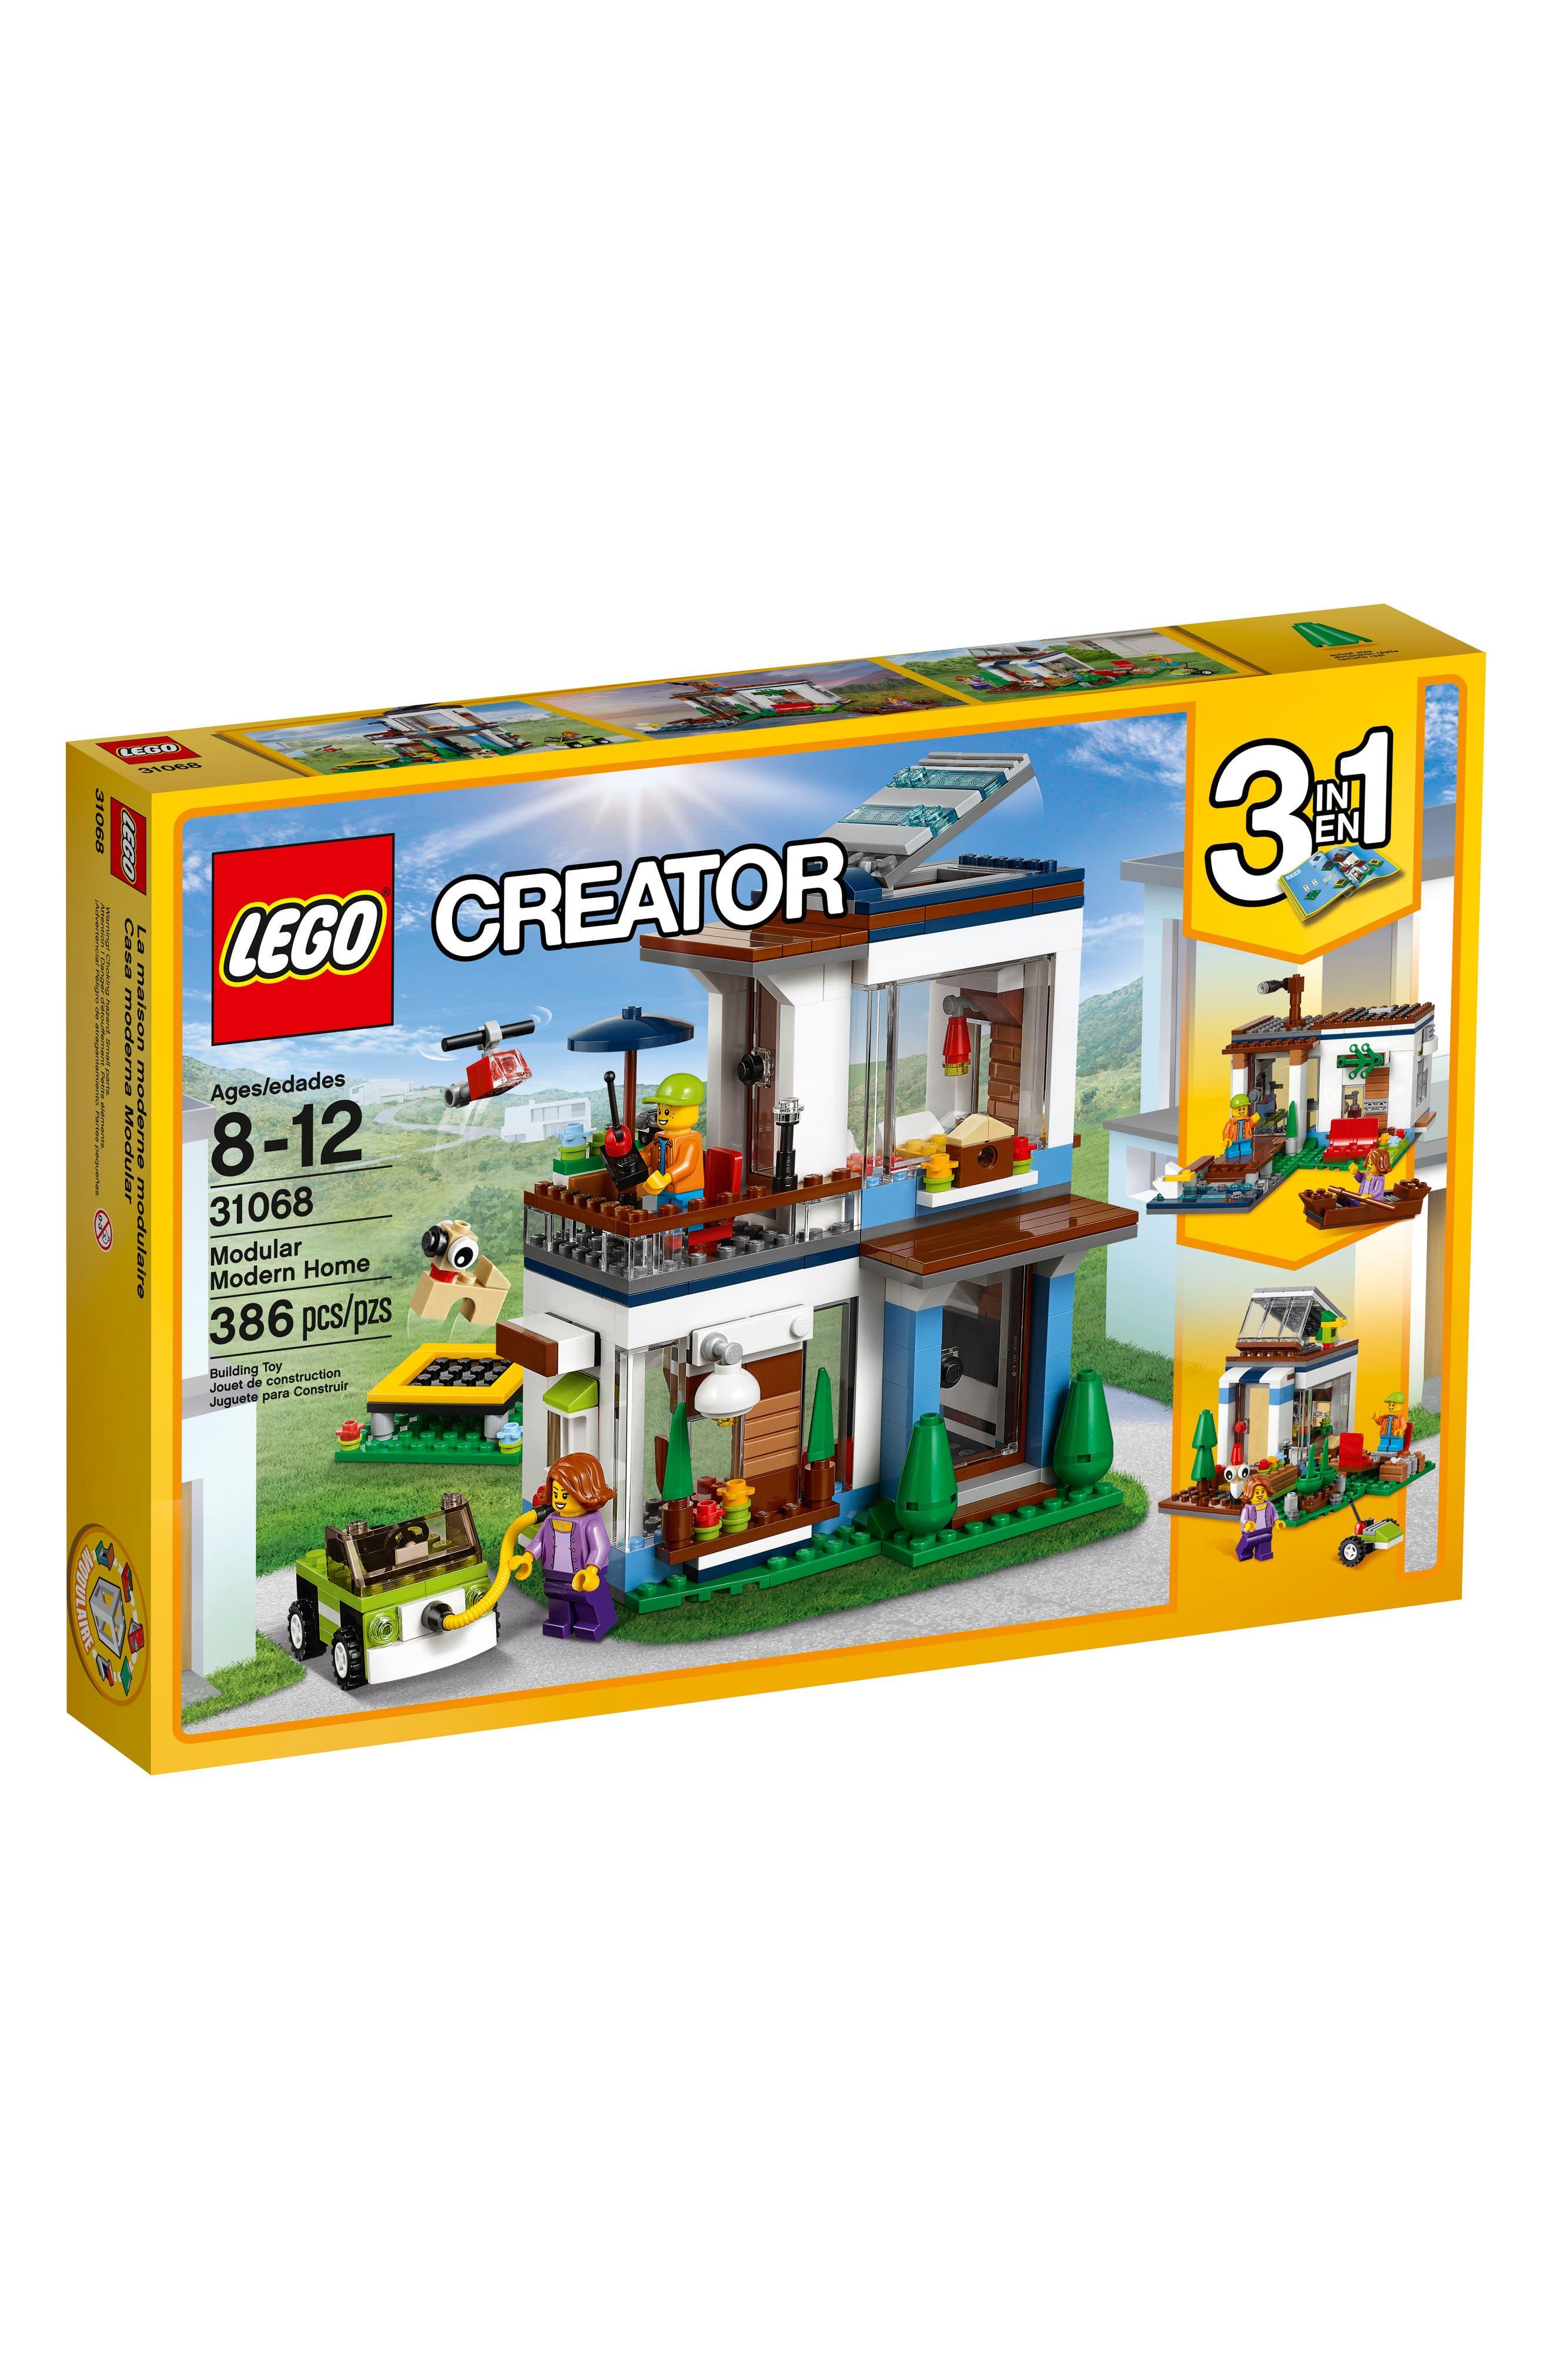 Main Image - LEGO® Creator 3-in-1 Modular Modern Home Play Set - 31068